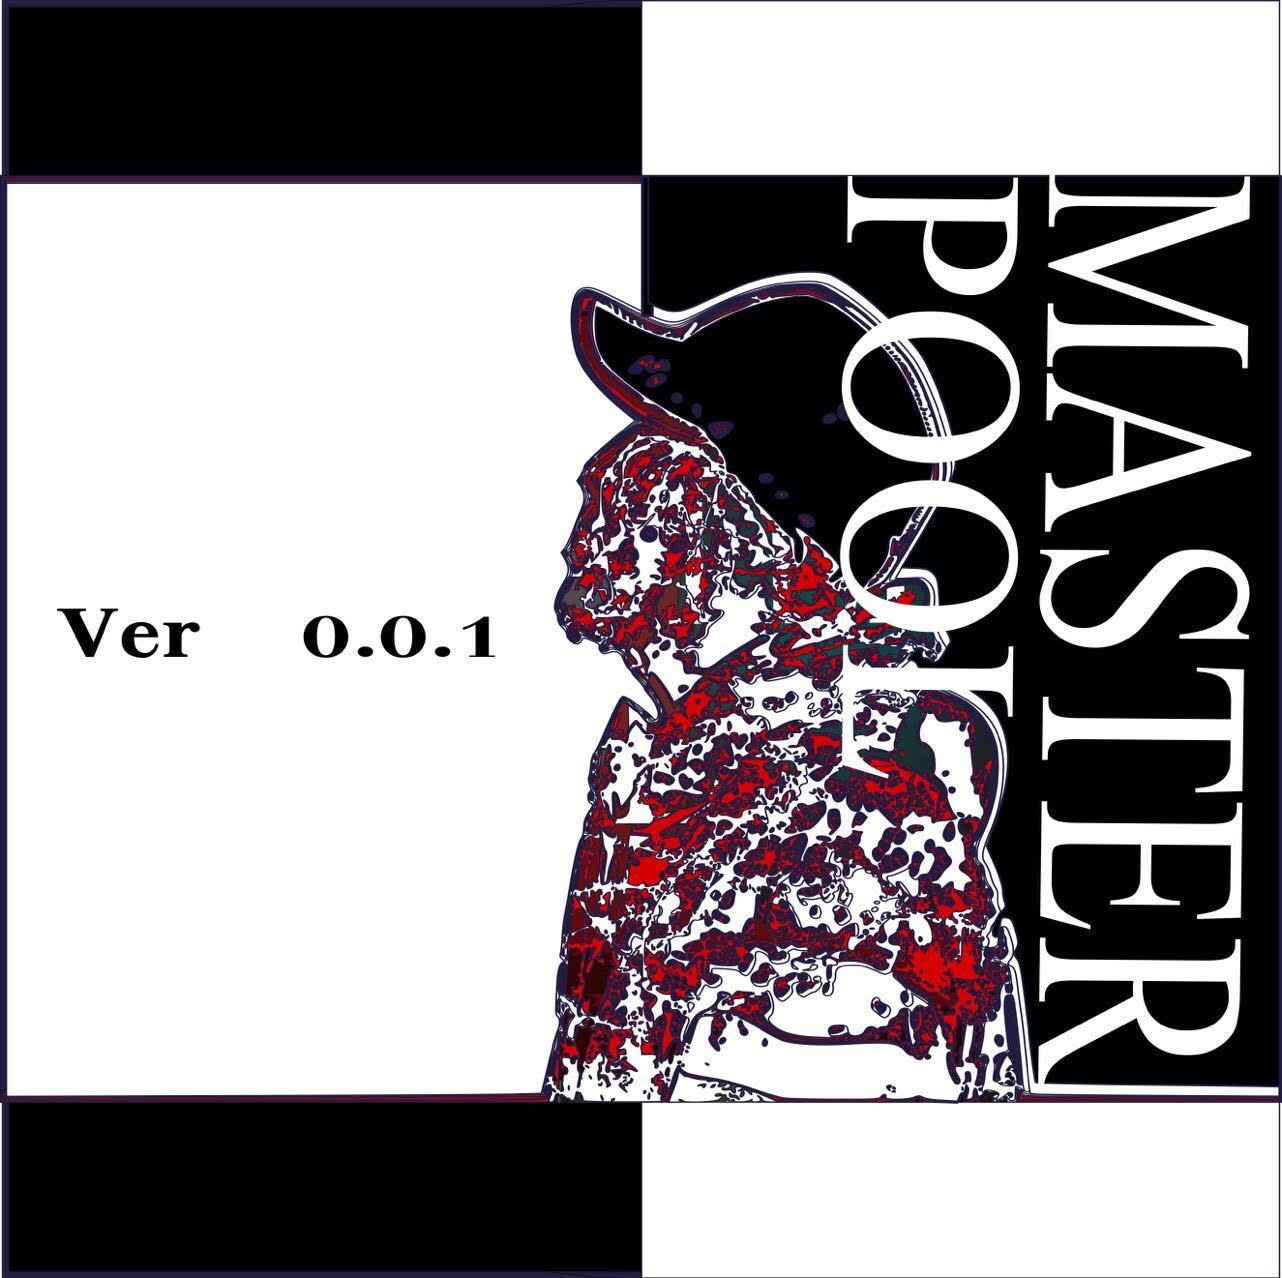 MASTER POOL / Ver 0.0.1